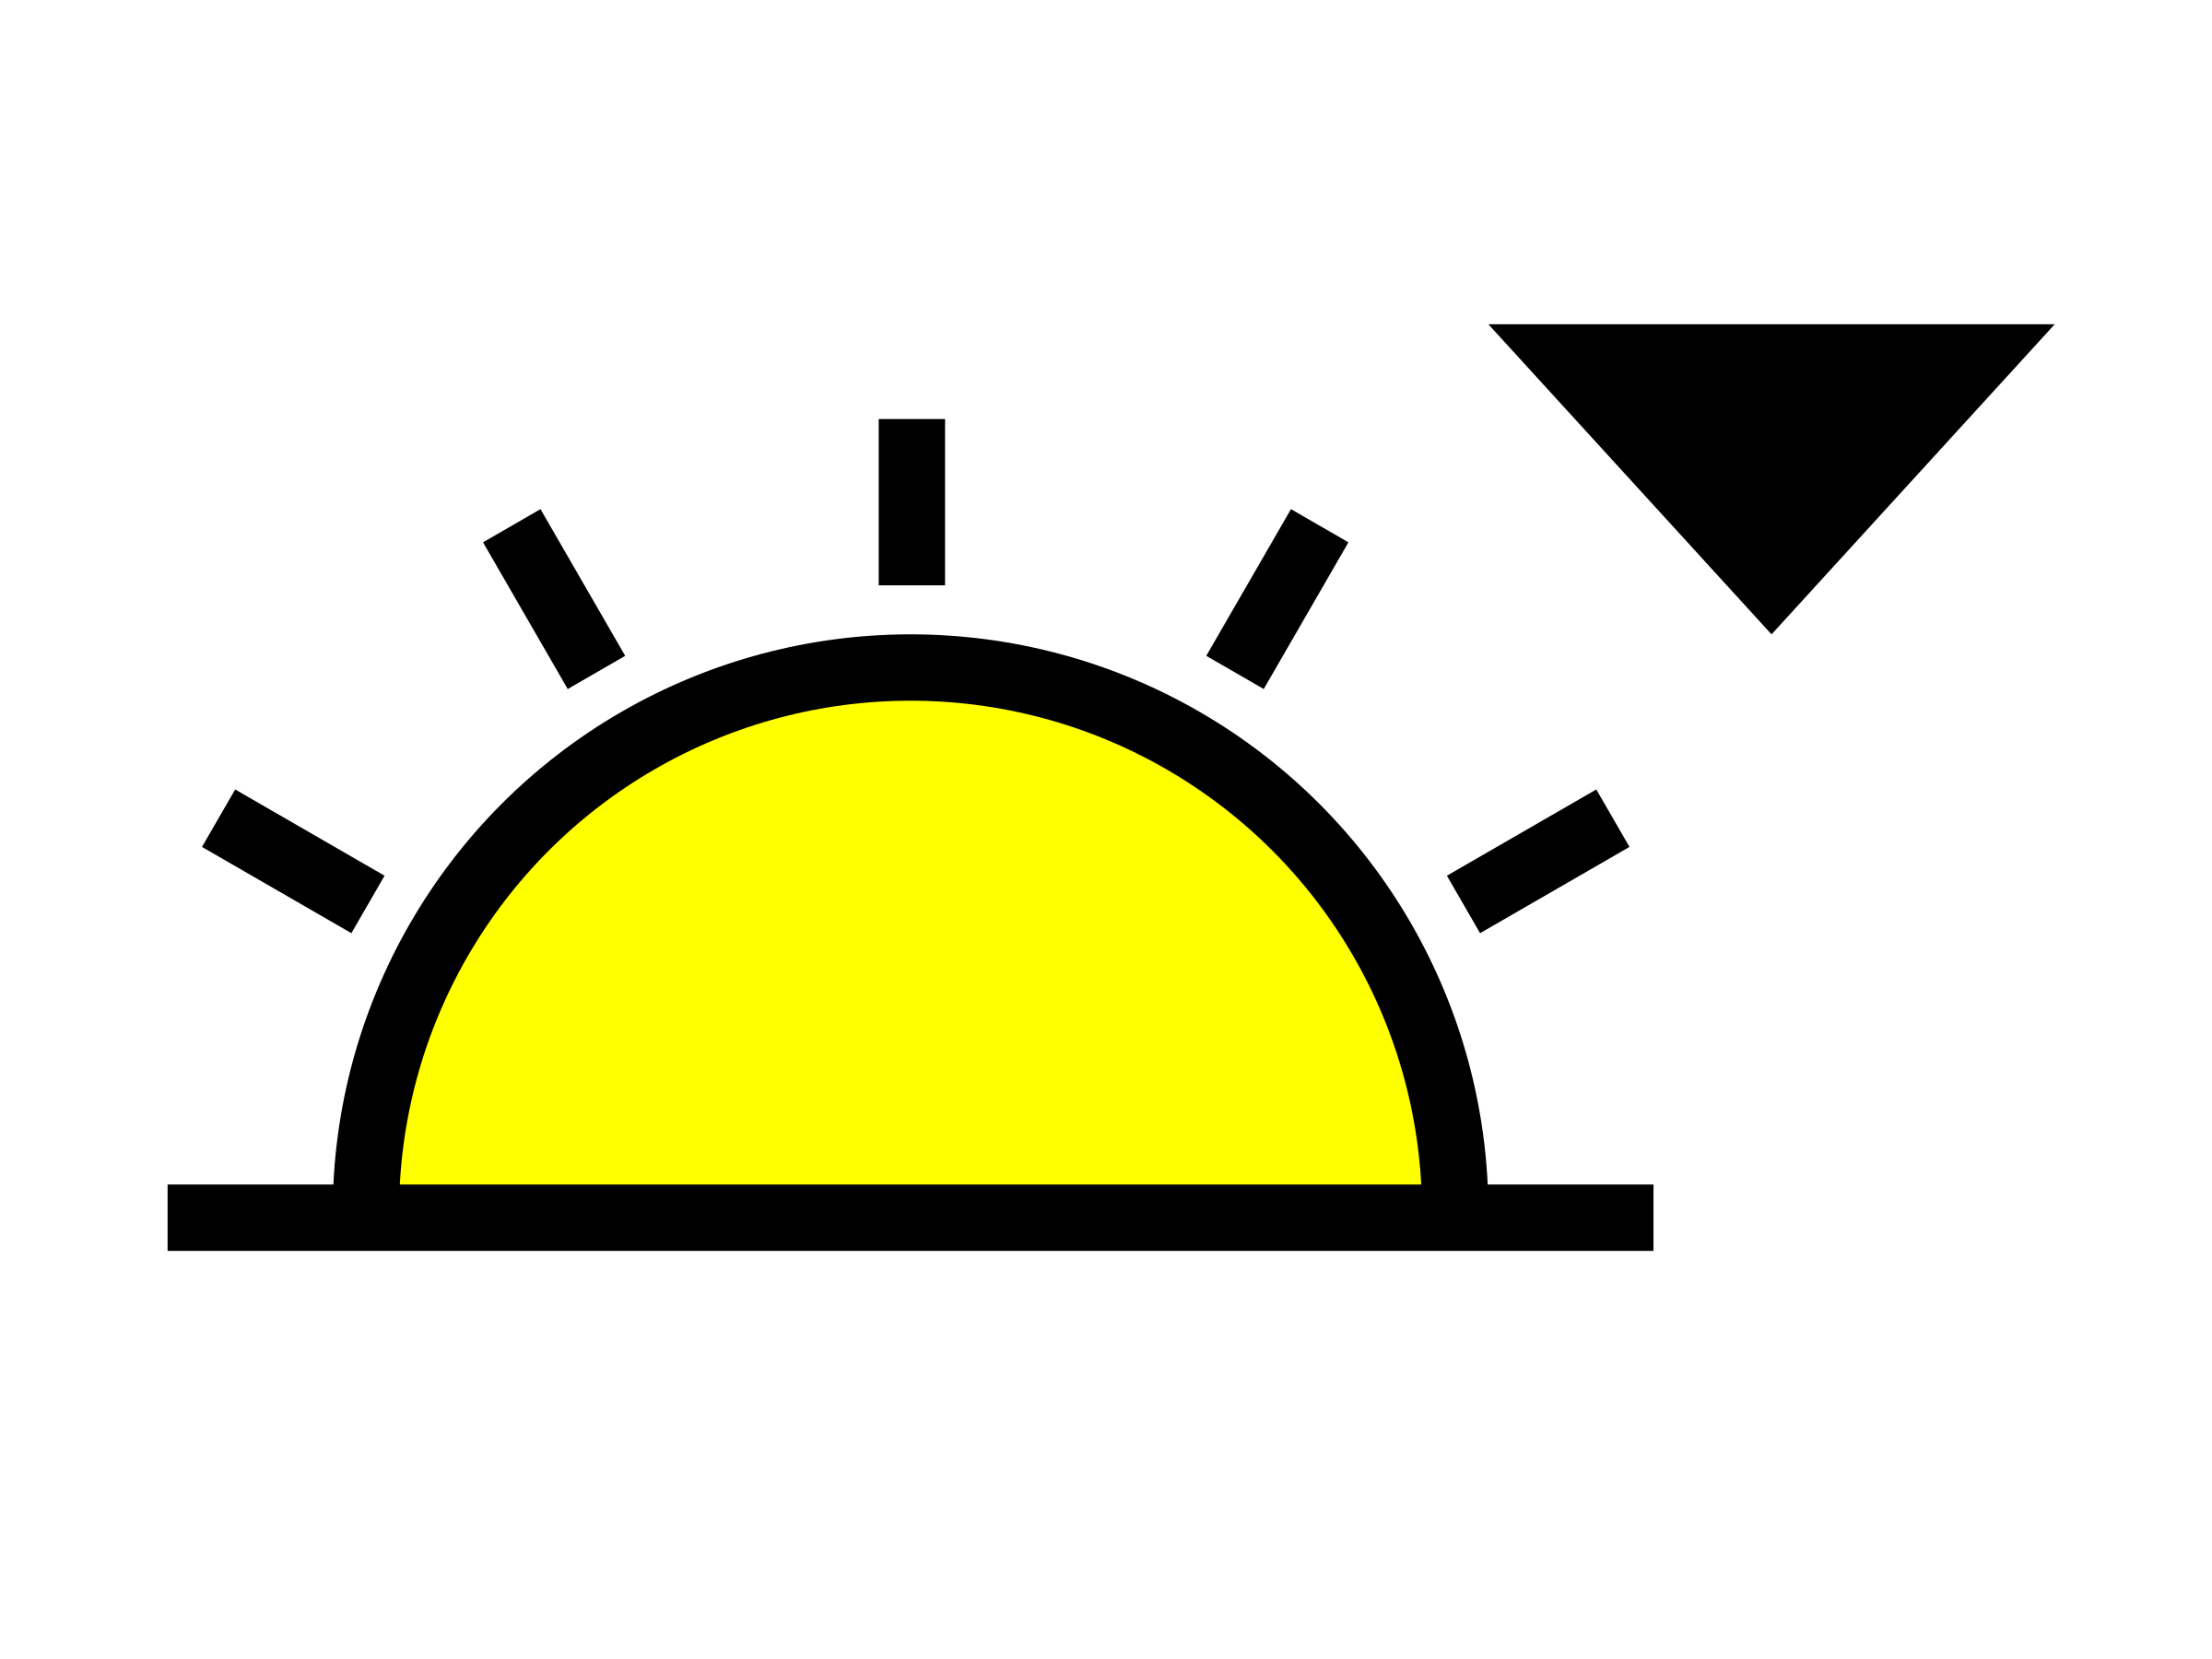 sunset clipart sun set